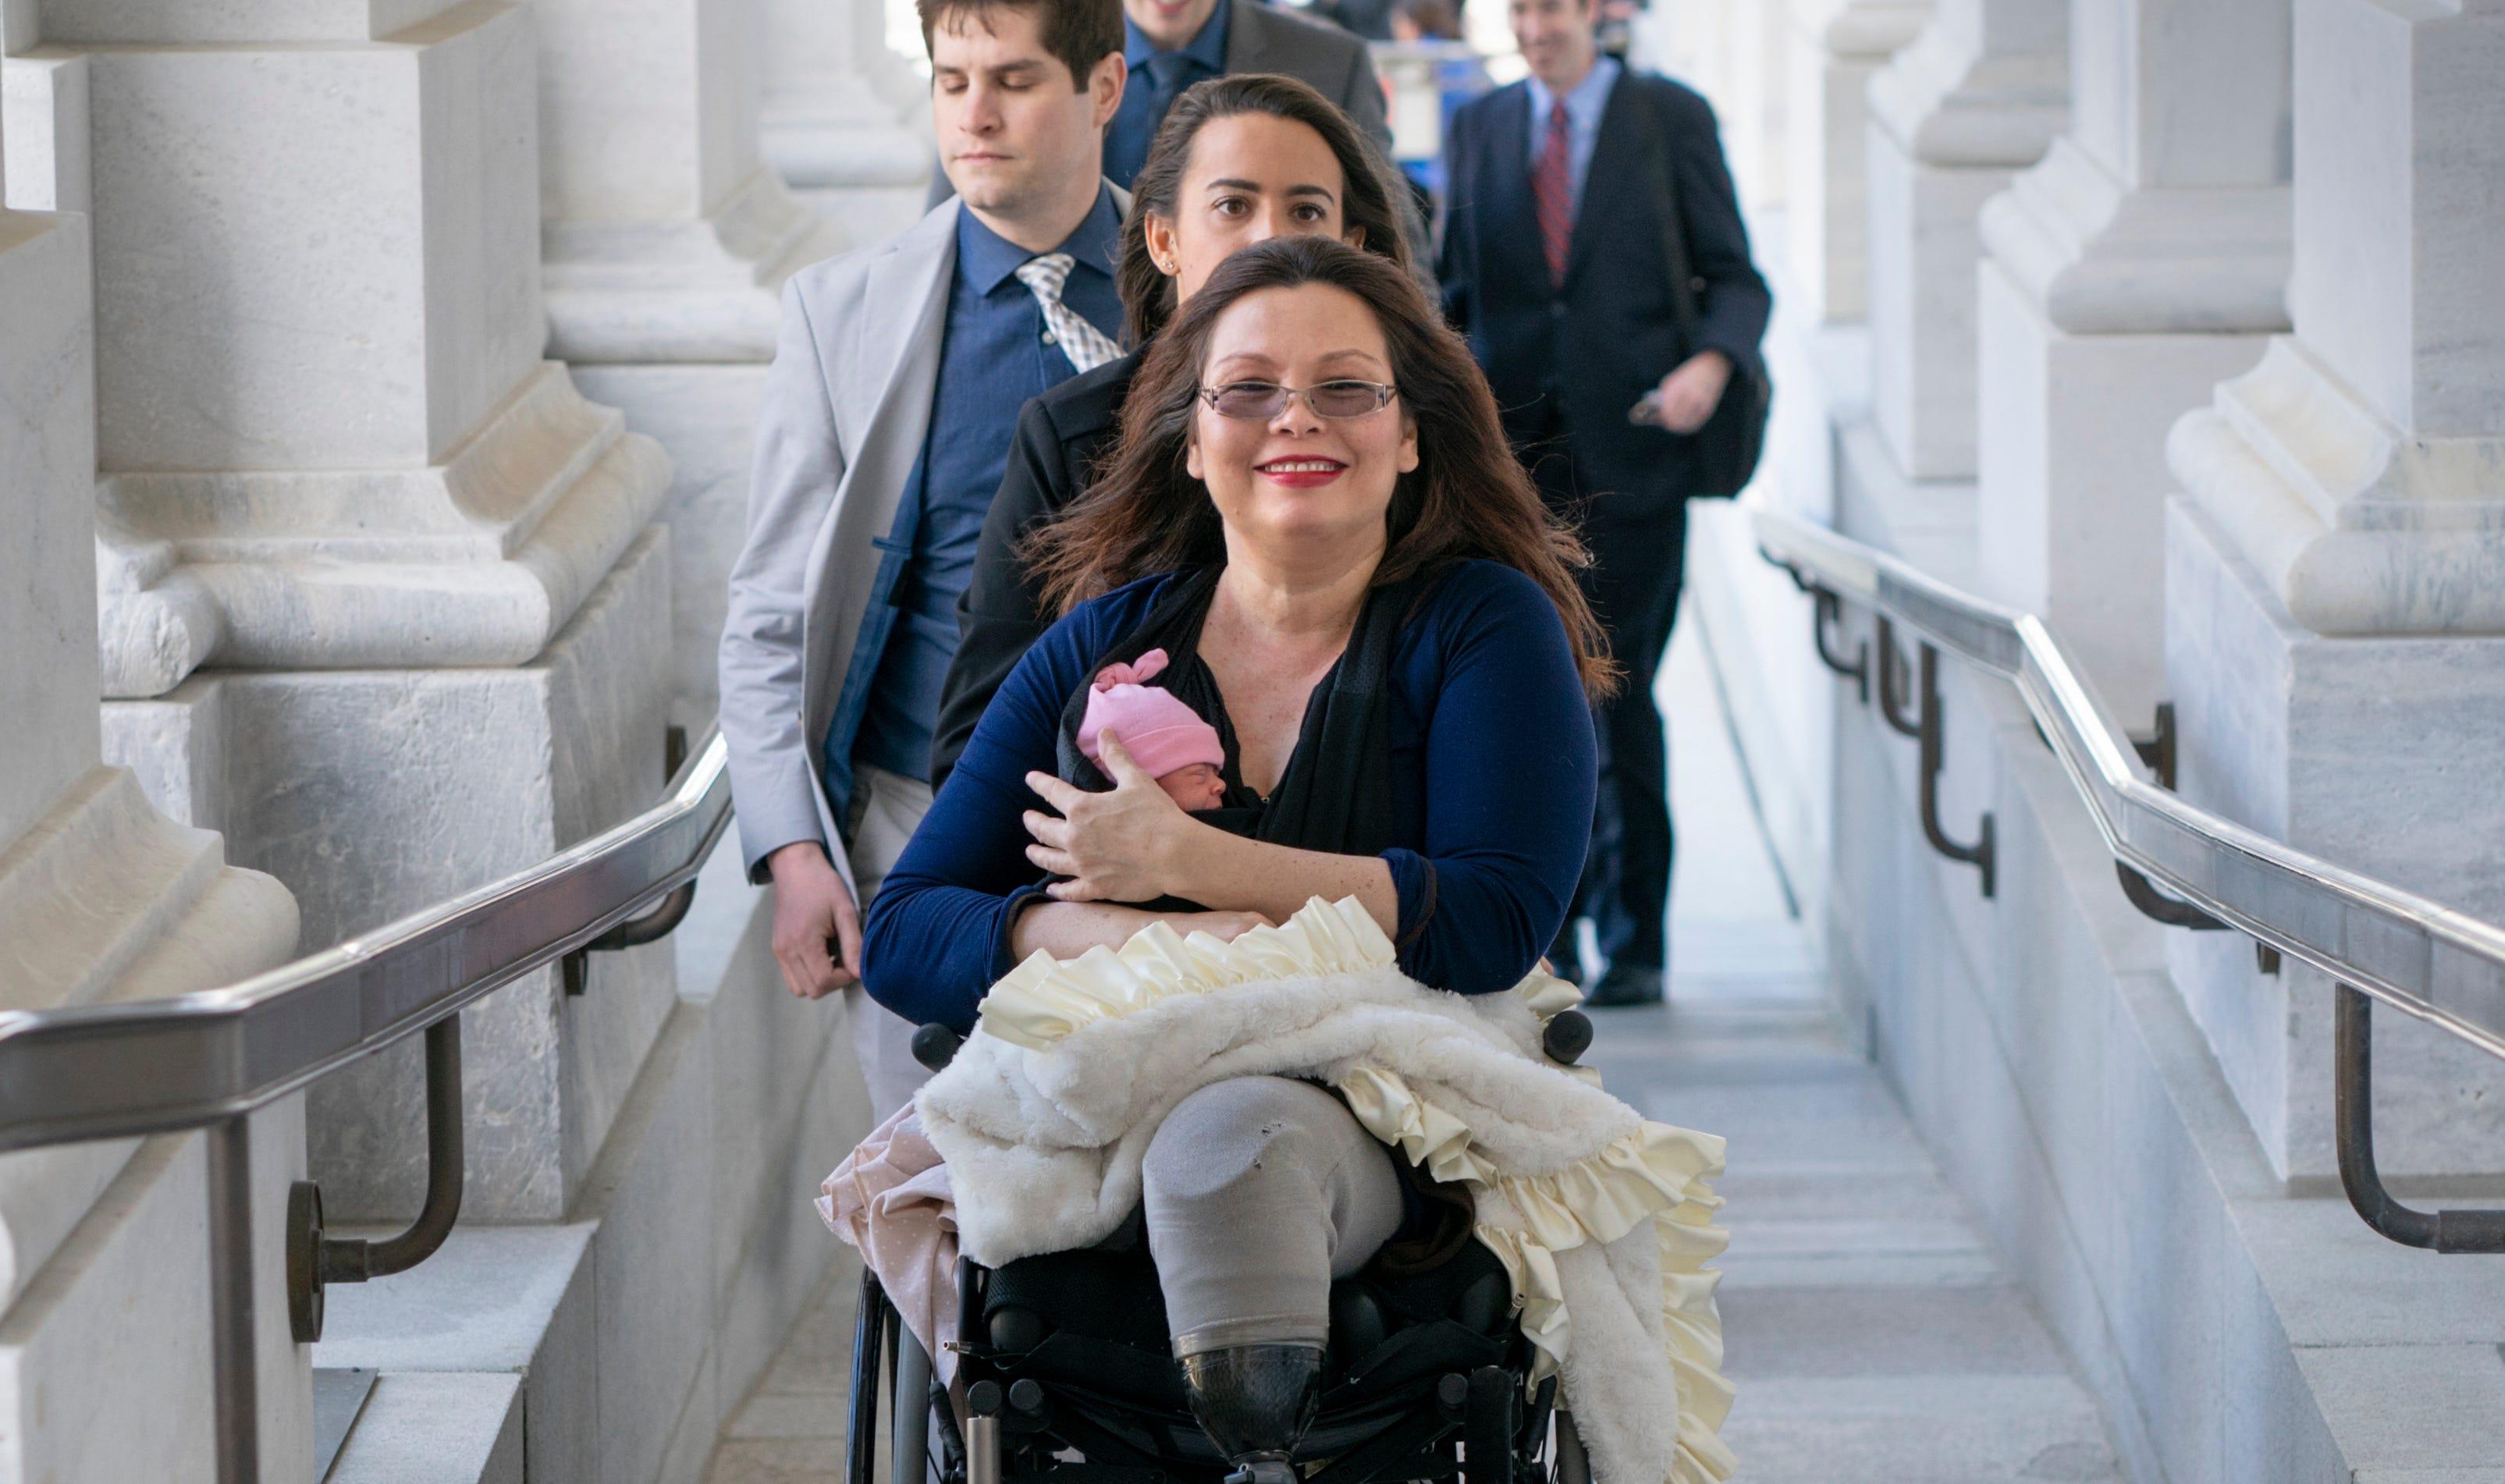 The Senate celebrates Sen. Tammy Duckworth, abandons America's other moms